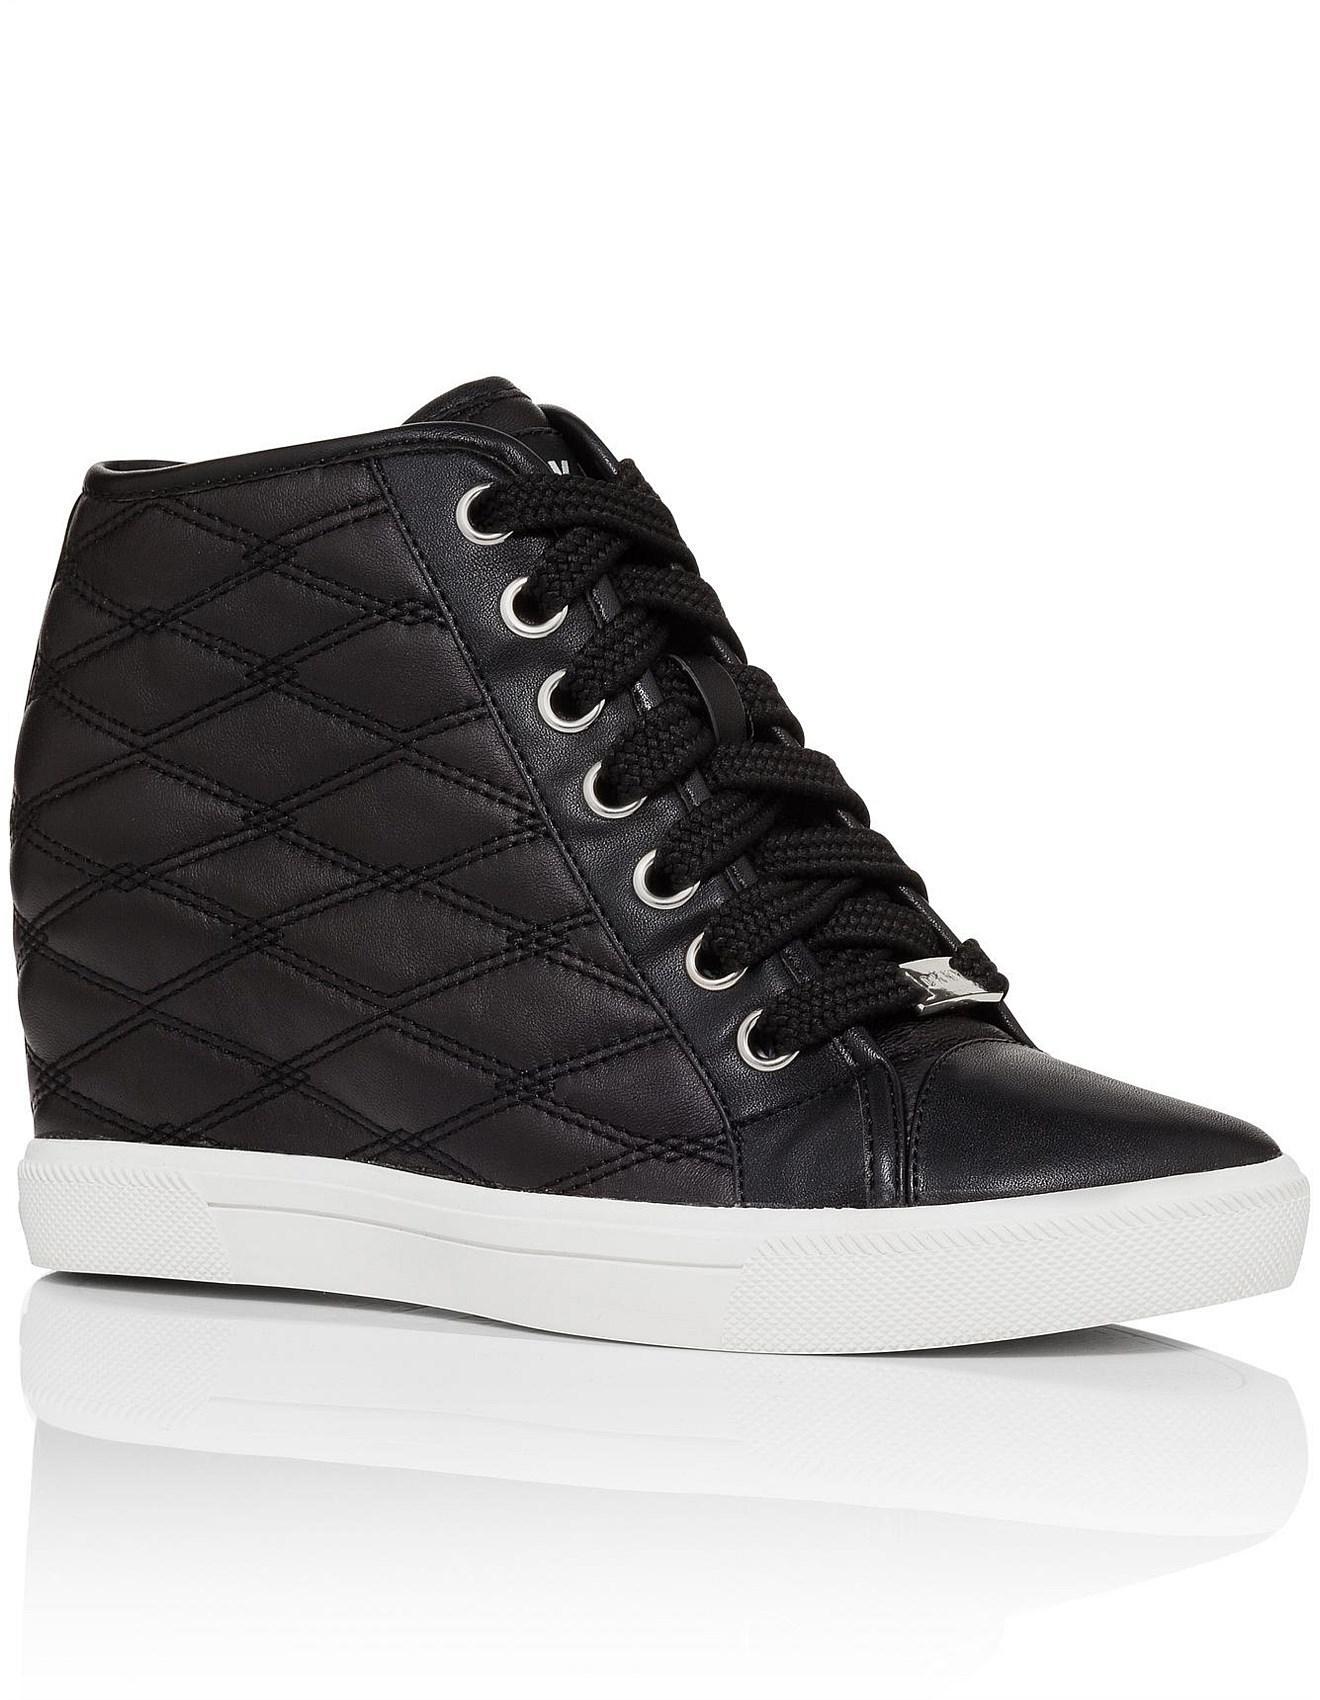 a23ffb63fef5 Sneaker negro Wedge Cindy Lyst Nappa Diamond acolchado en Dkny 54pwq7H